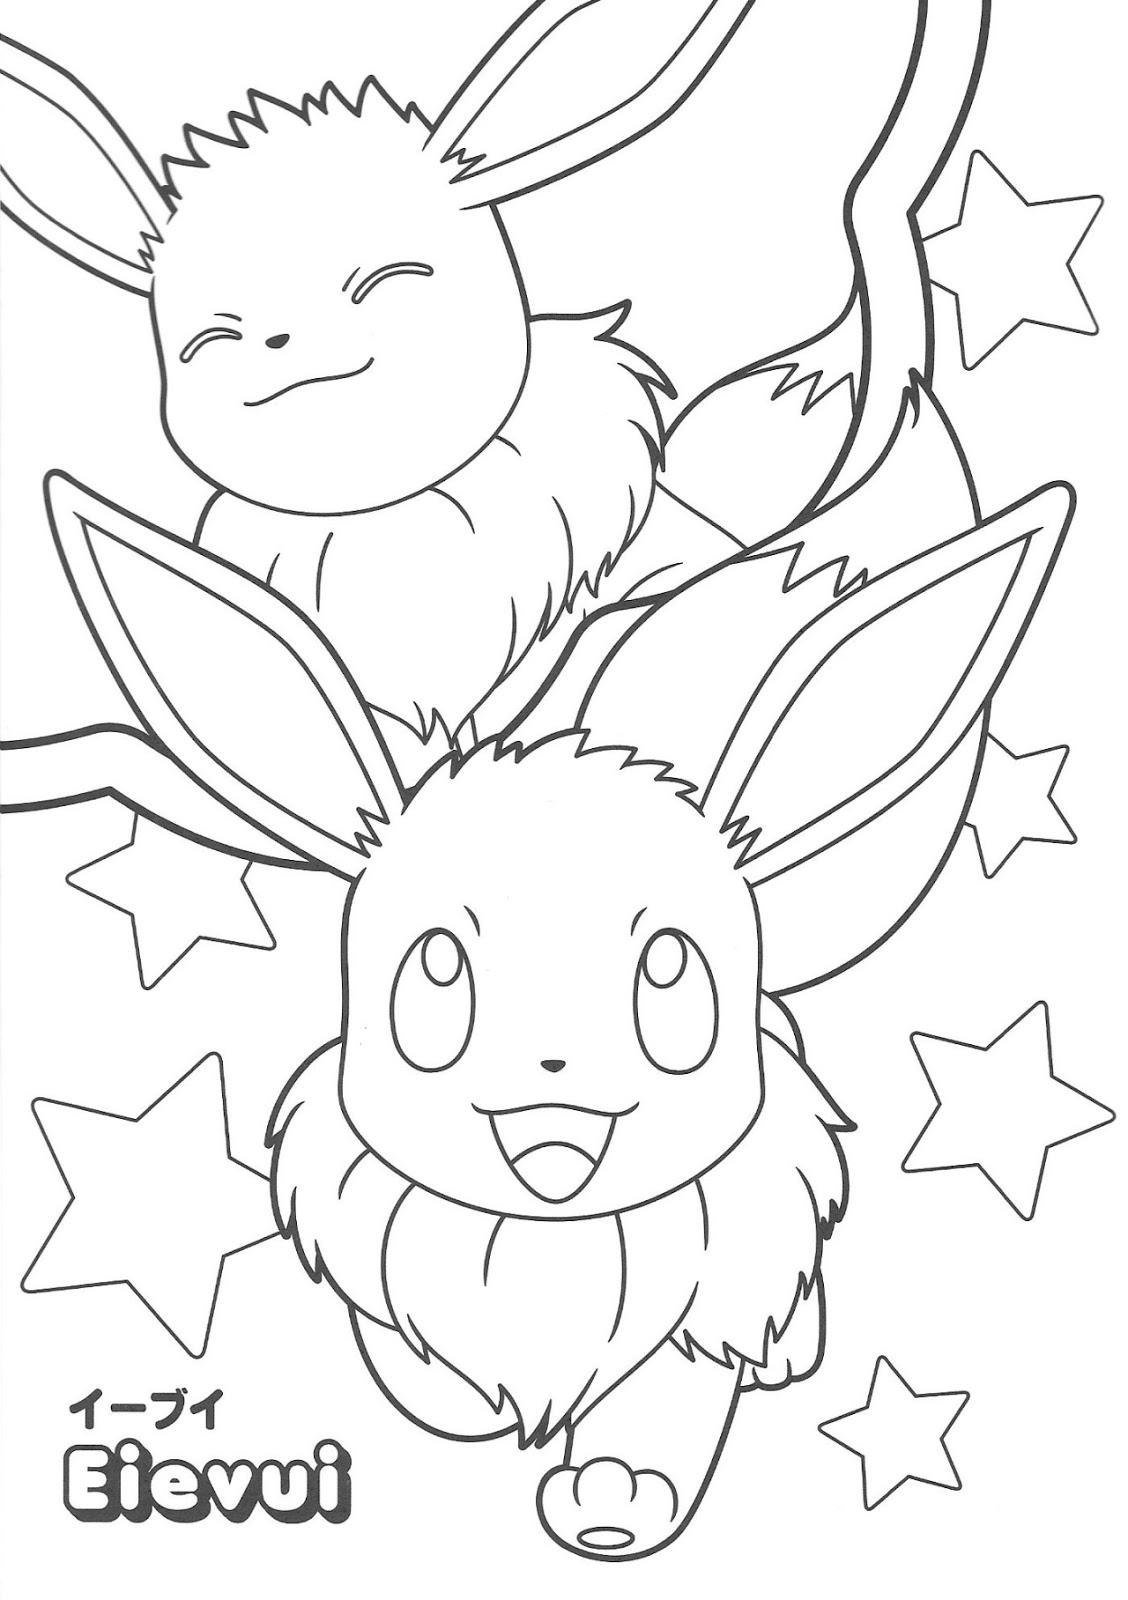 Desenhos Para Colorir Pikachu And Eevee Friends Oficial